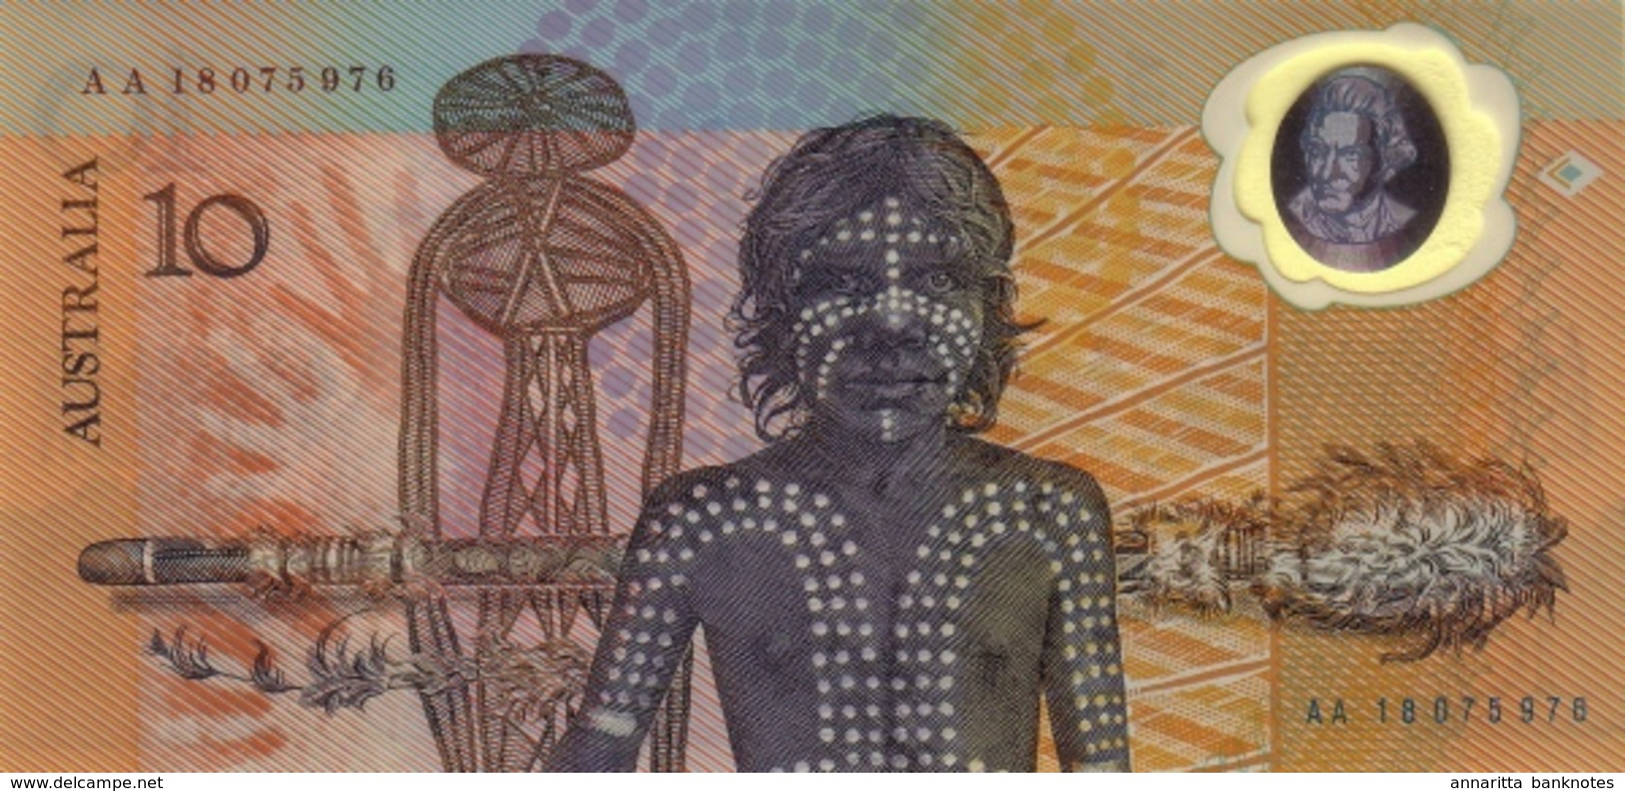 *  AUSTRALIA 10 DOLLARS ND (1988) P-49a UNC COMMEMORATIVE [AU217a] - Decimaal Stelsel Overheidsuitgave 1966-...